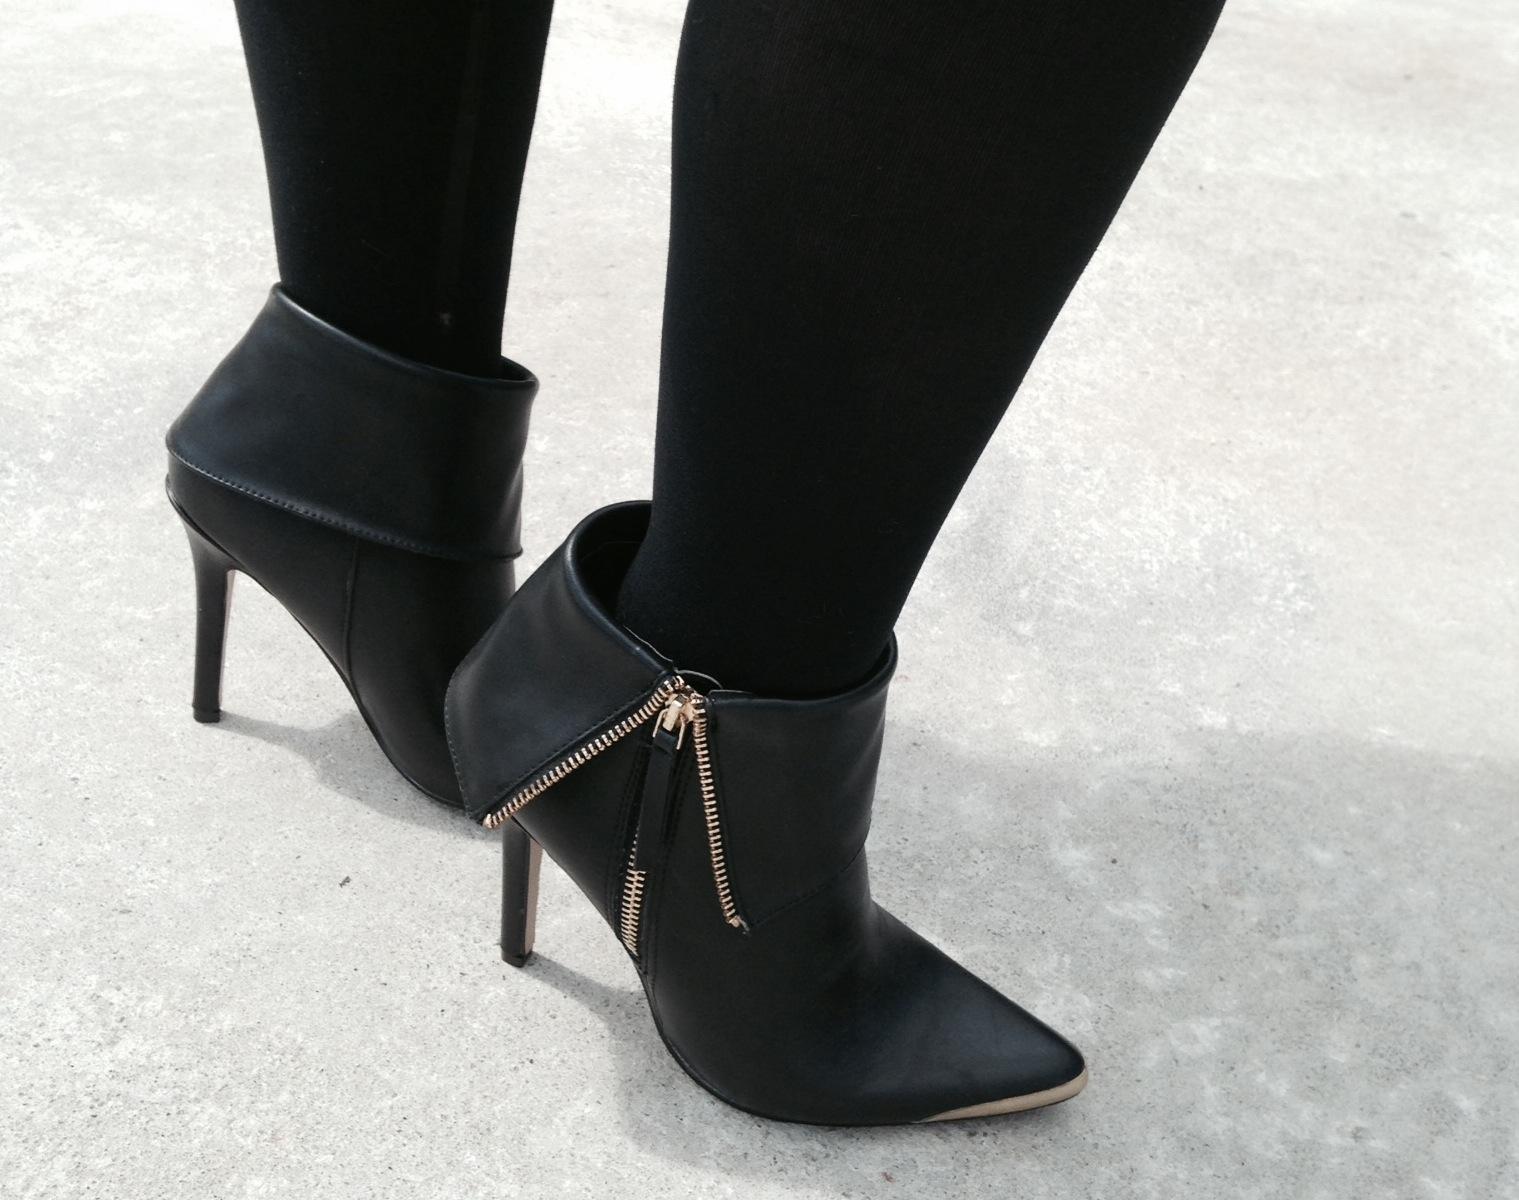 candy washington_black leather booties.JPG